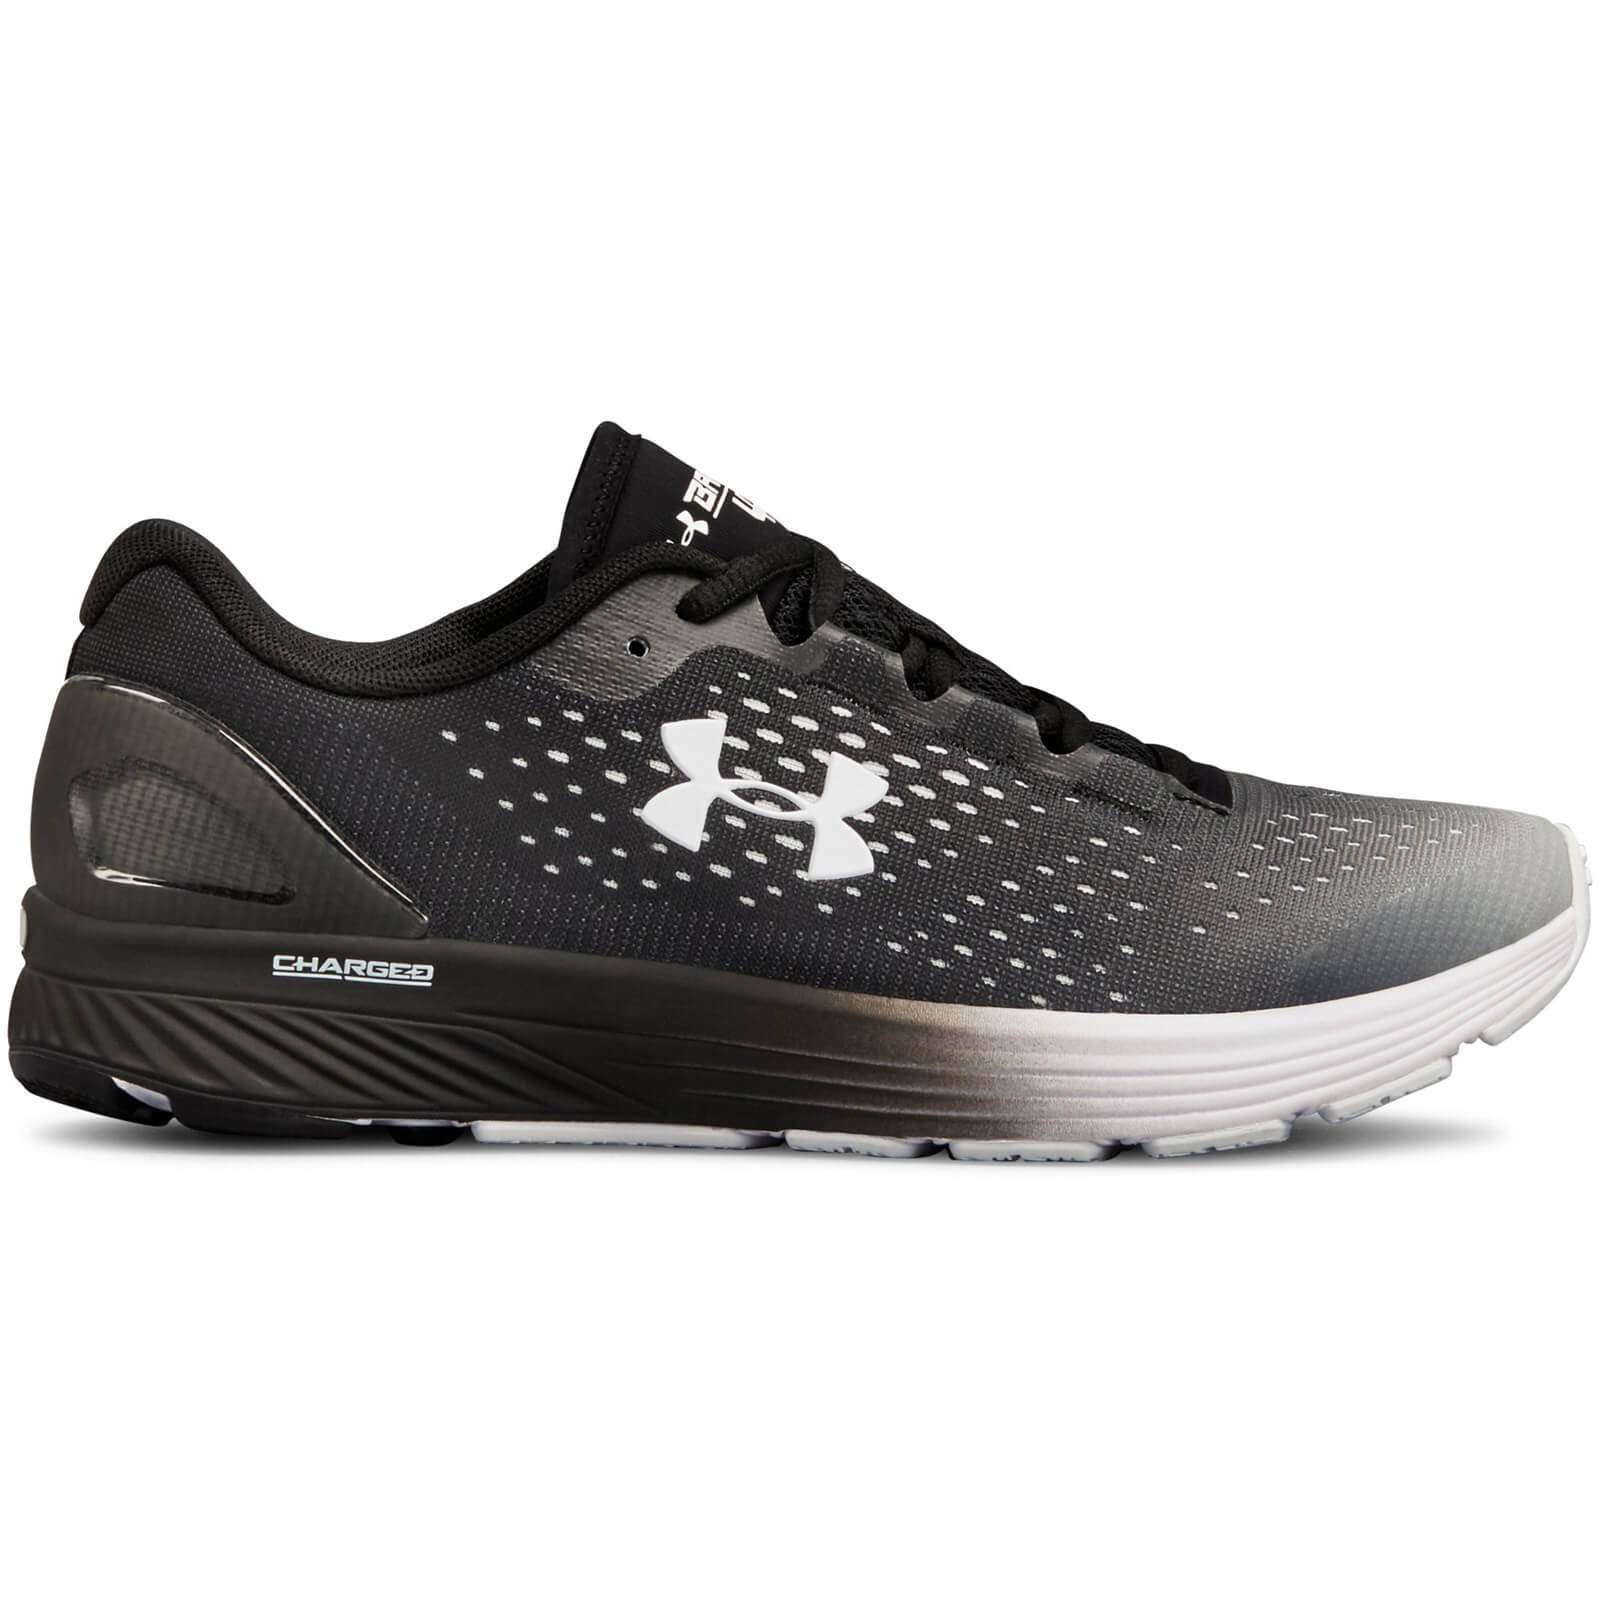 Under Armour Women's Charged Bandit 4 Running Shoes - Black/White - US 7.5/UK 5 - Black/White